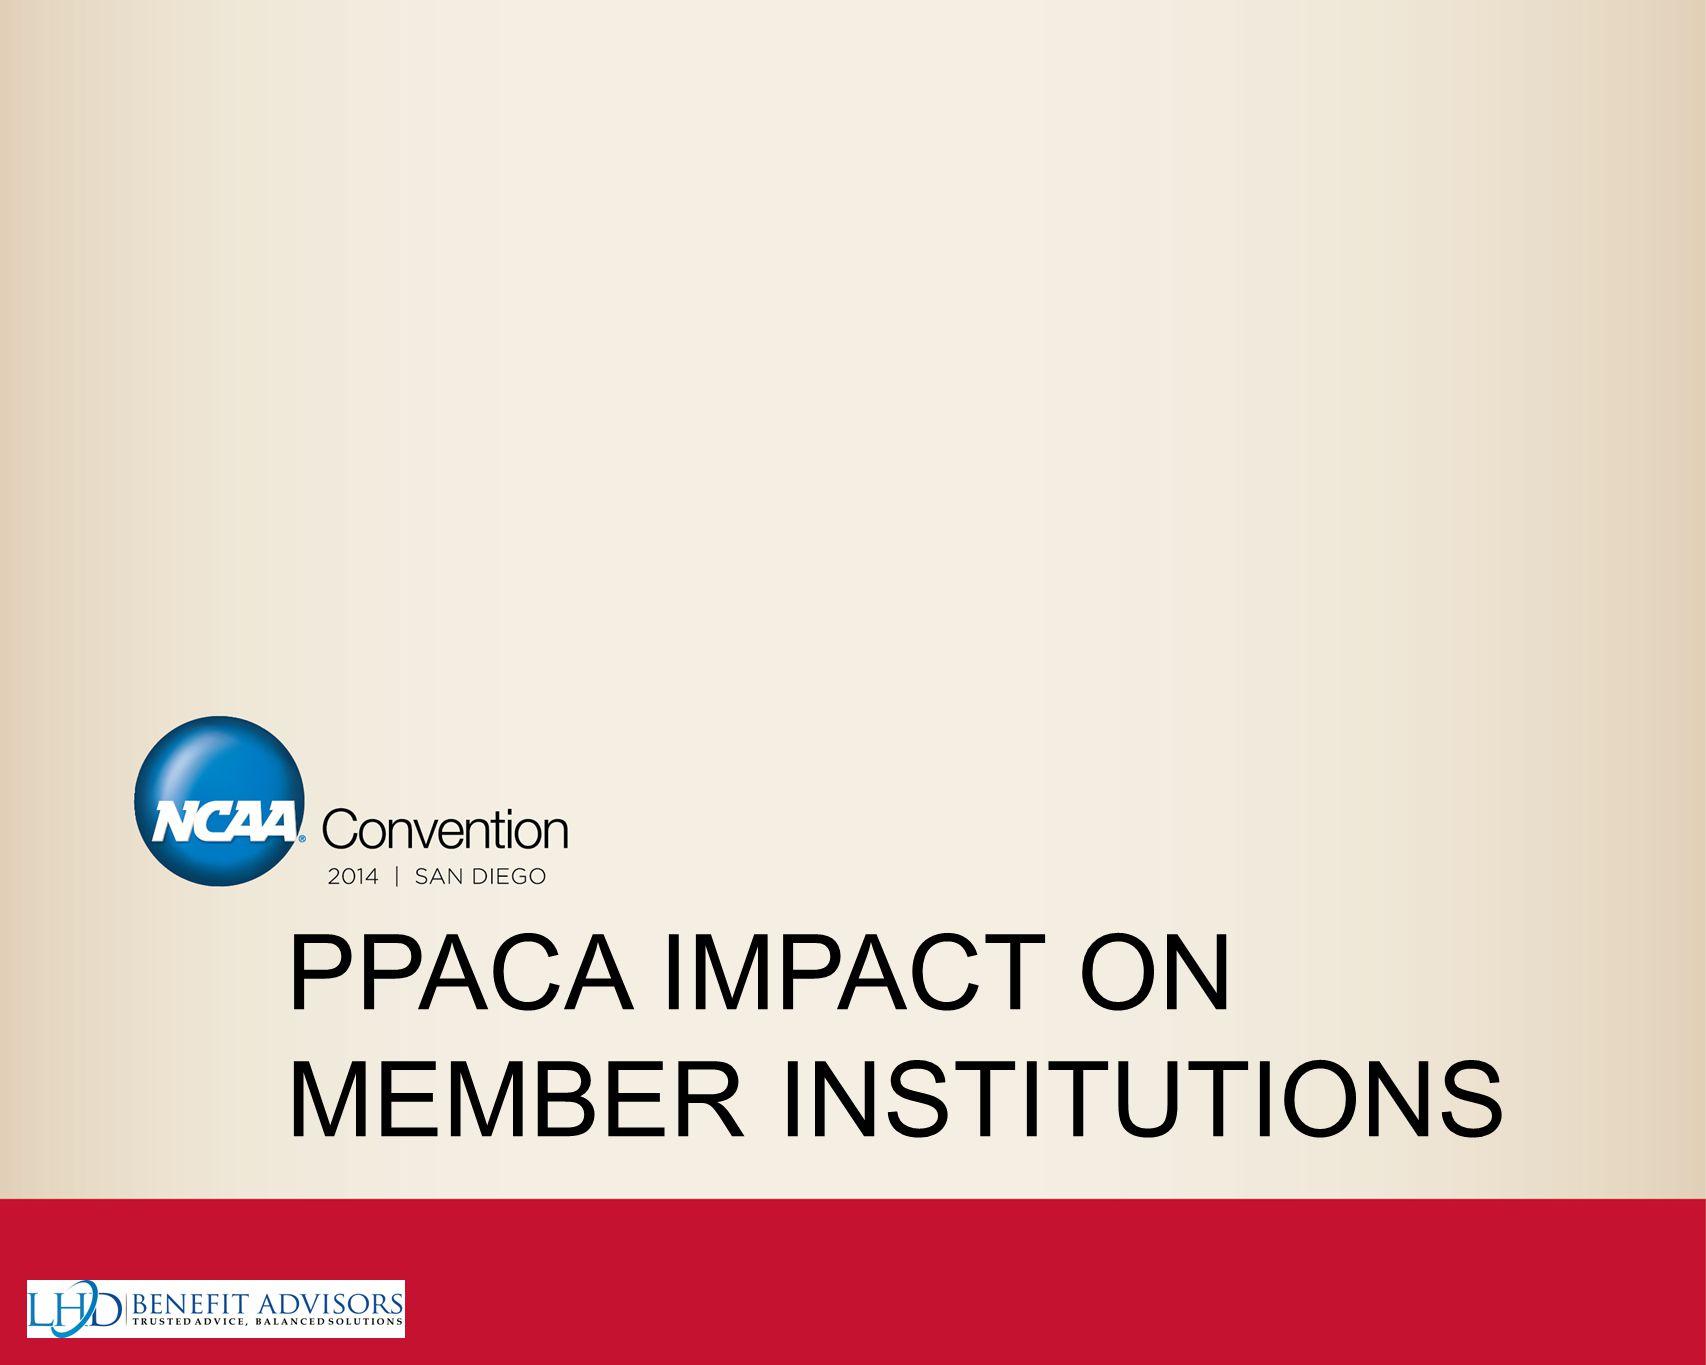 PPACA IMPACT ON MEMBER INSTITUTIONS